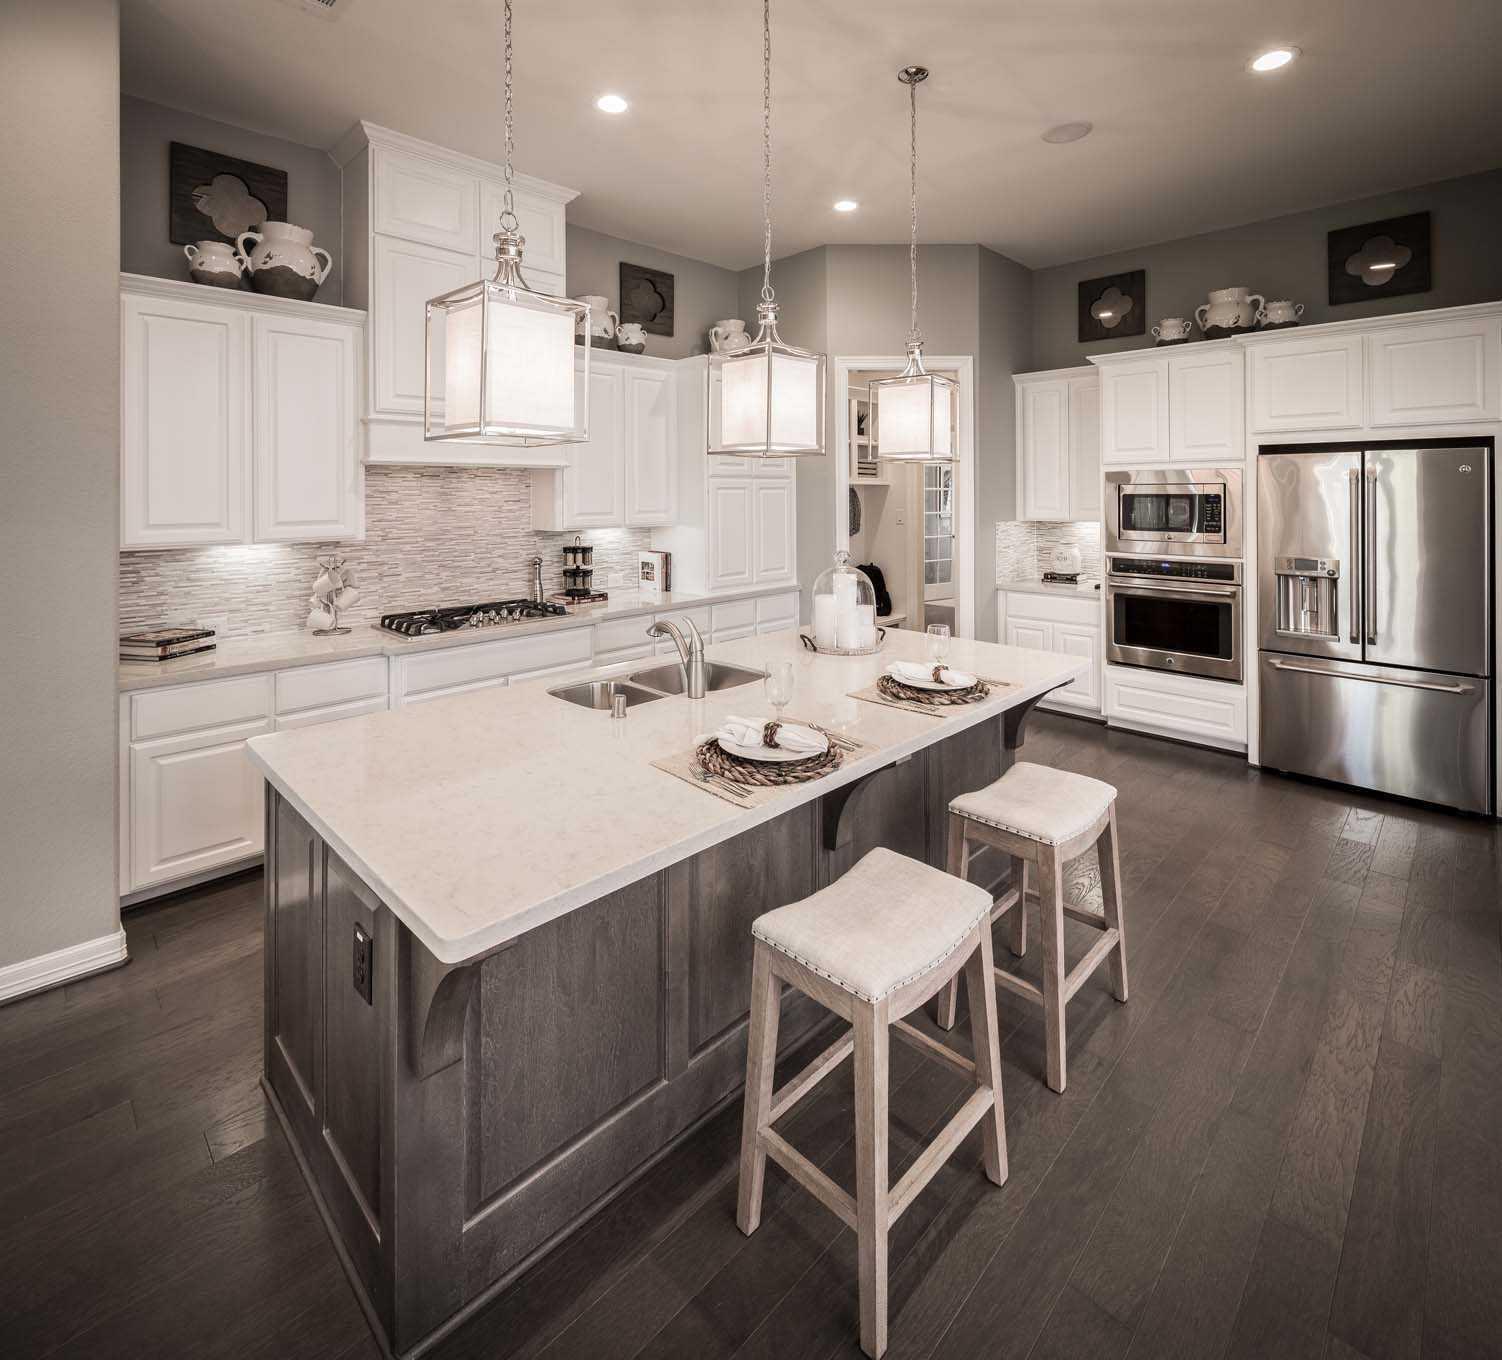 Kitchen-in-Plan 297-at-Star Trail: 86ft. lots-in-Prosper